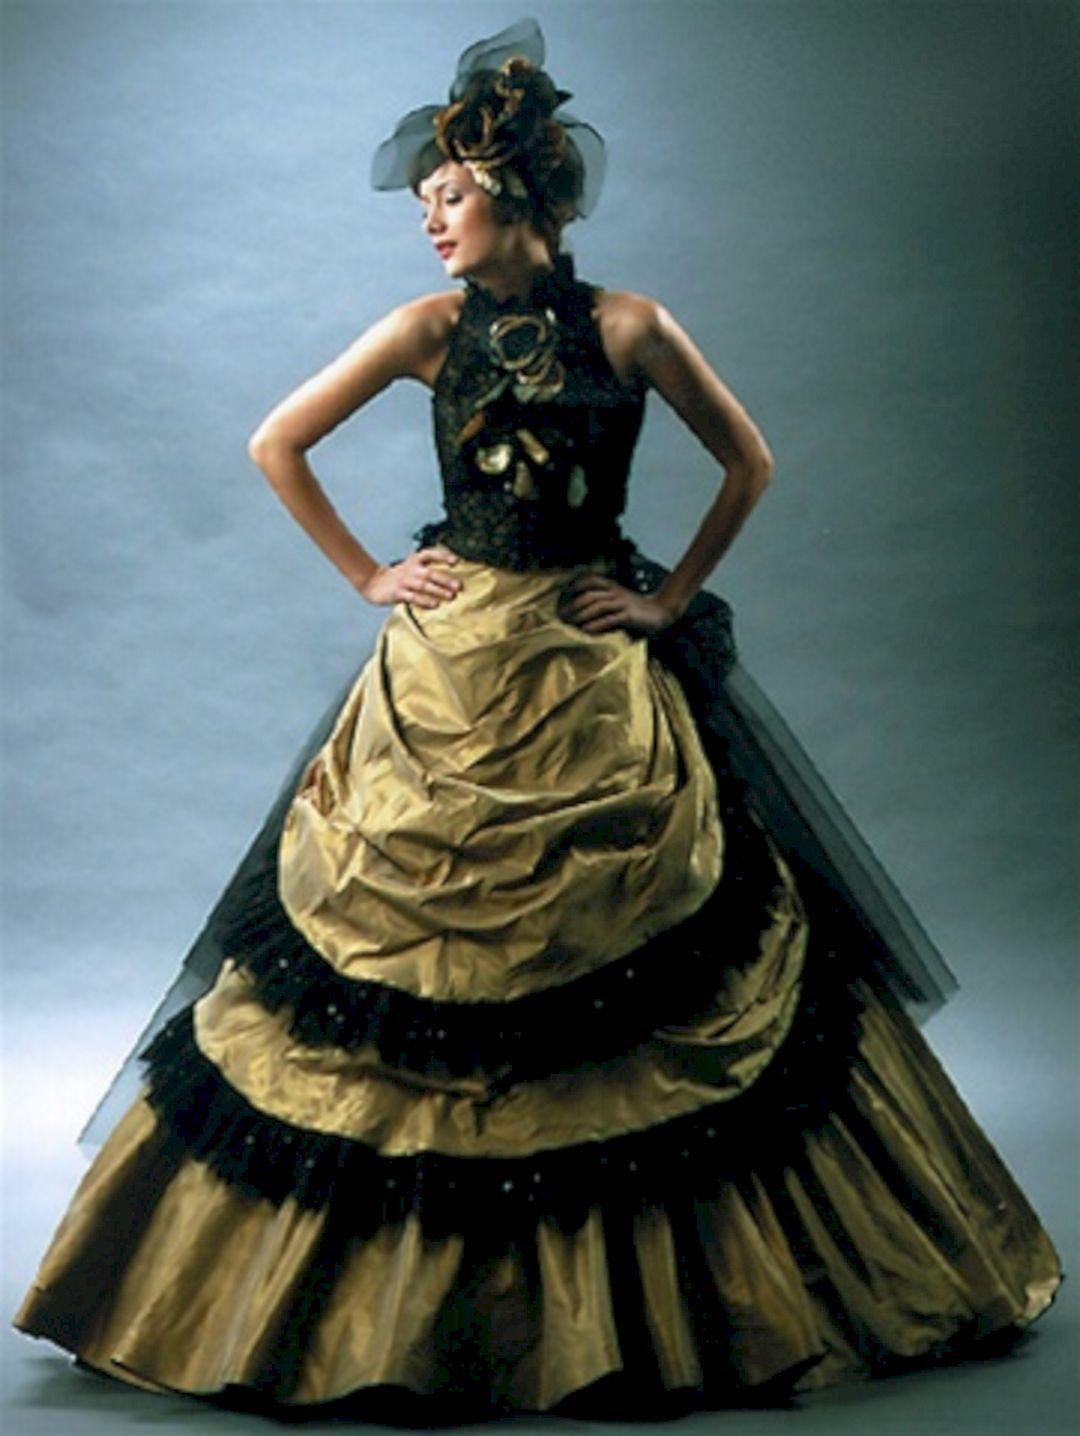 Best 15 Black Gold Wedding Gown For Bride Looks More Elegant Gold Wedding Dress Black Wedding Dresses Orange Dress Wedding [ 1436 x 1080 Pixel ]